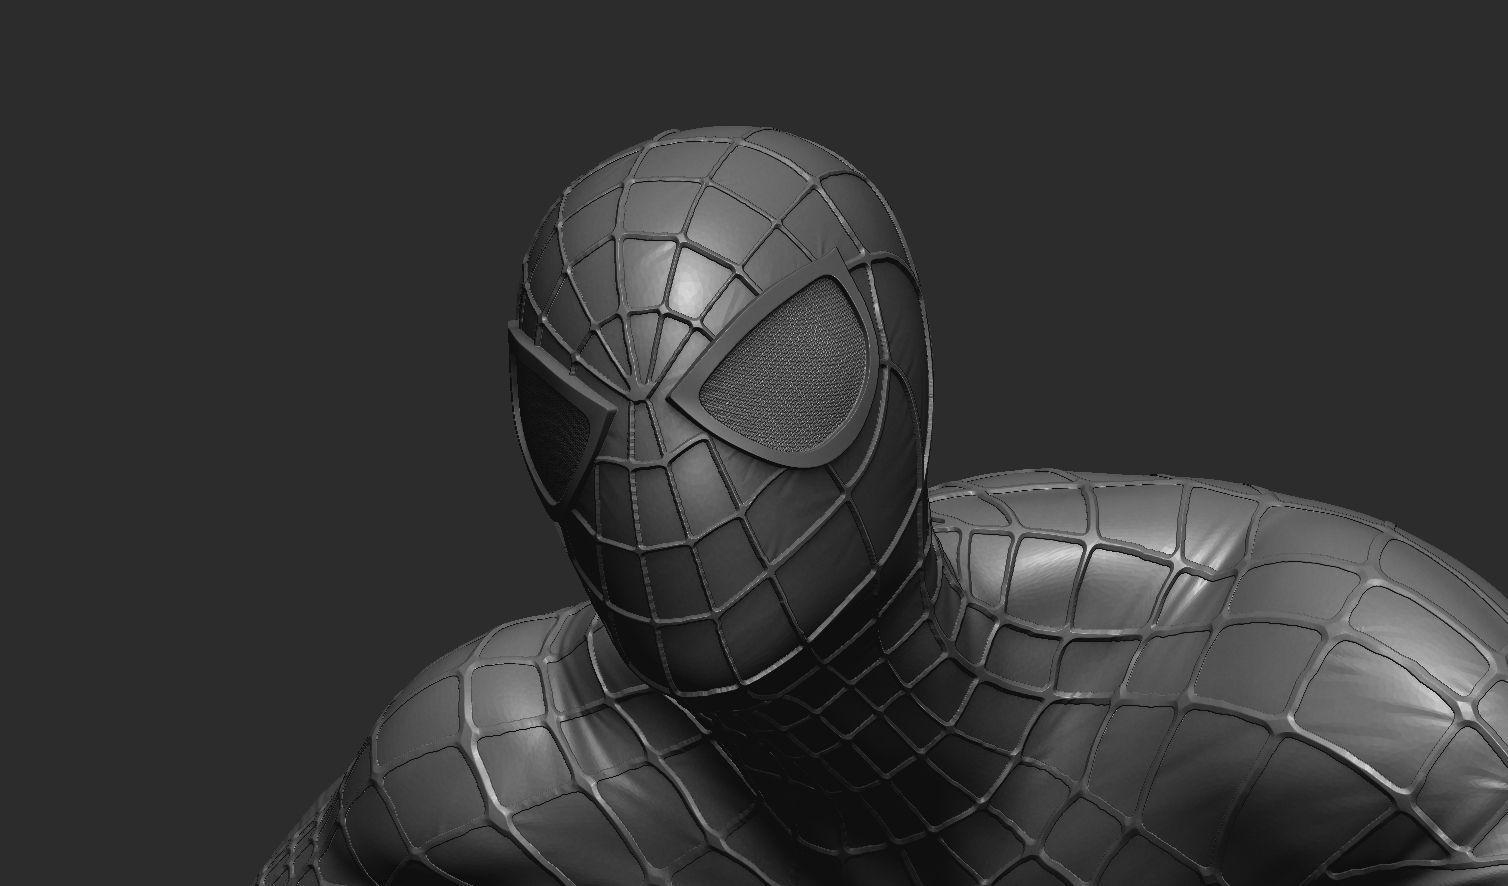 Spider-man Model